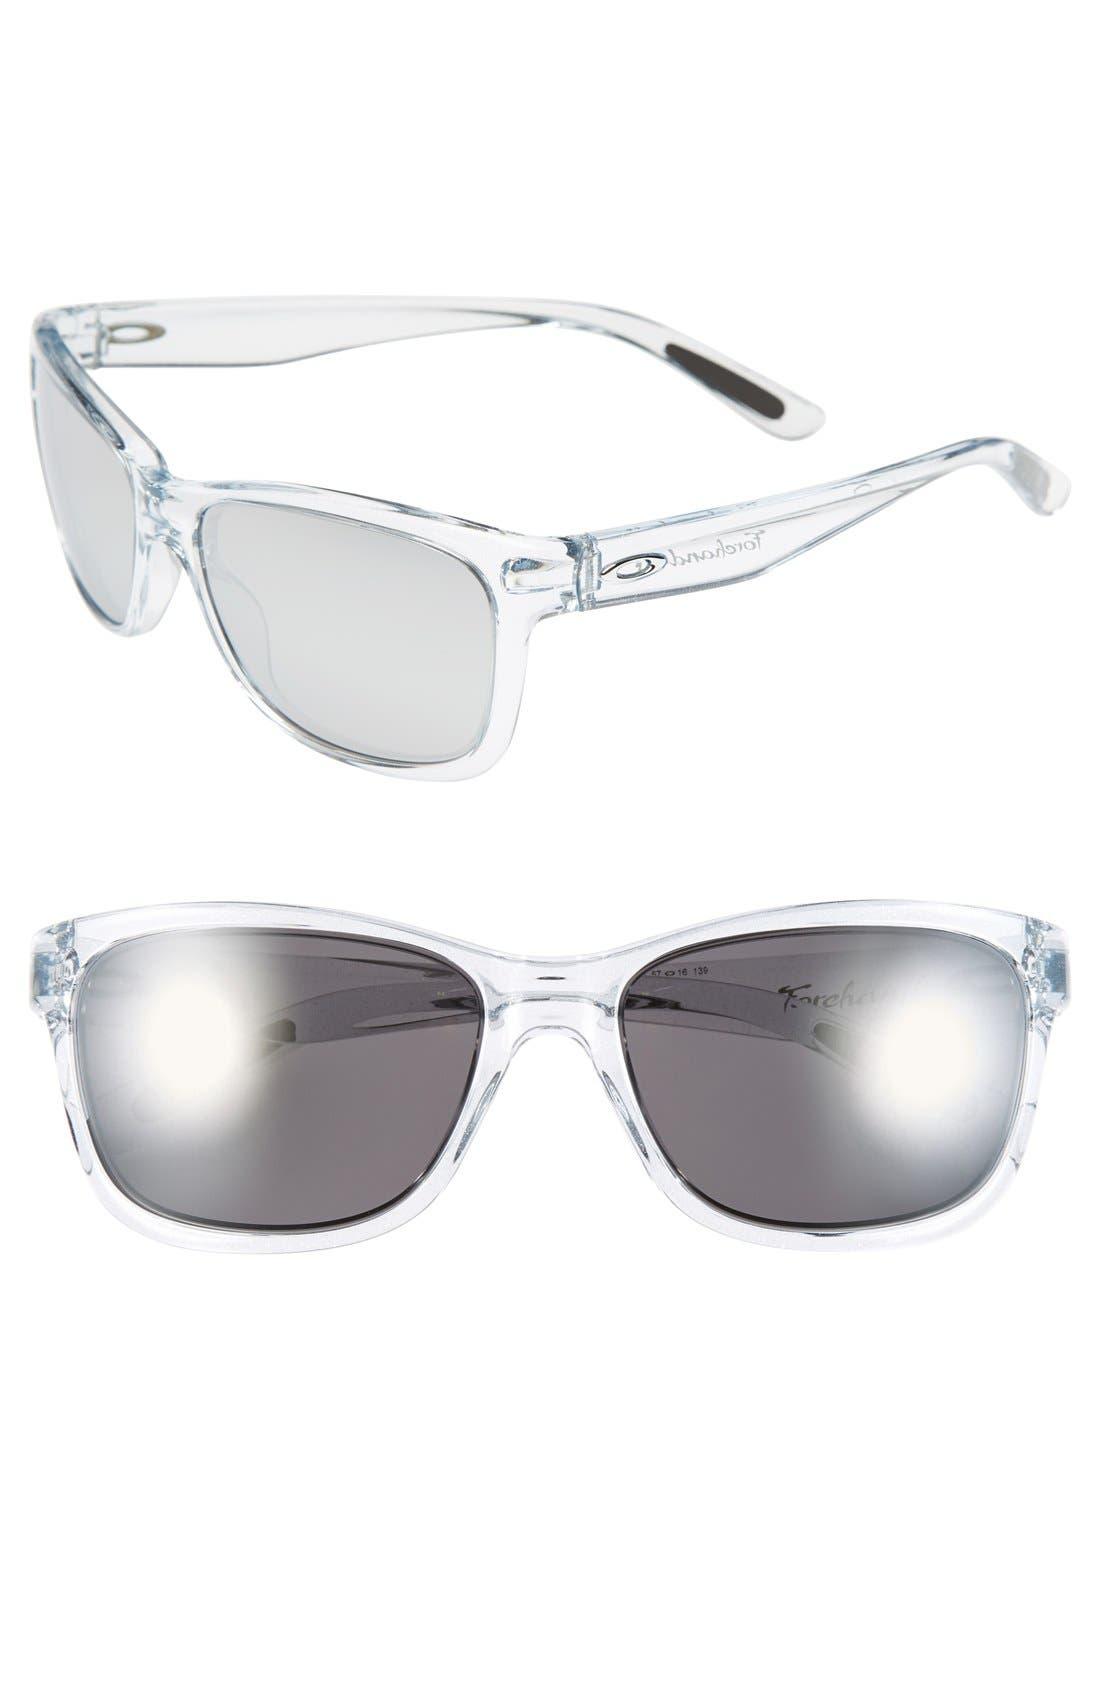 Main Image - Oakley 'Forehand' 57mm Sunglasses